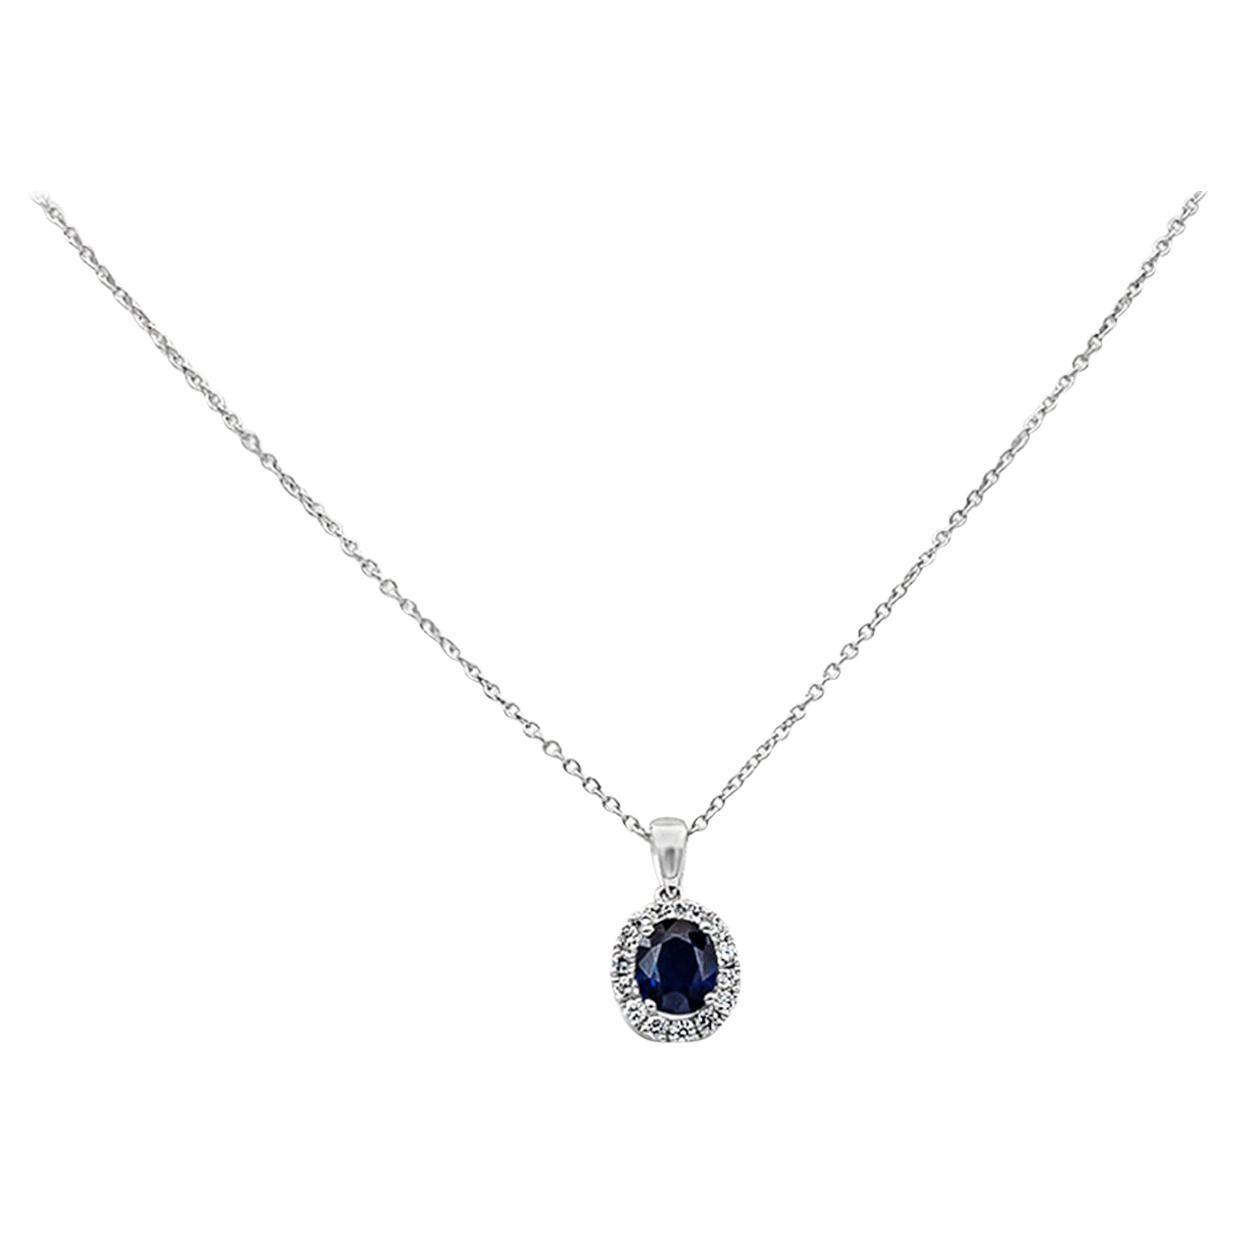 0.73 Carat Blue Sapphire and Diamond Halo Pendant Necklace